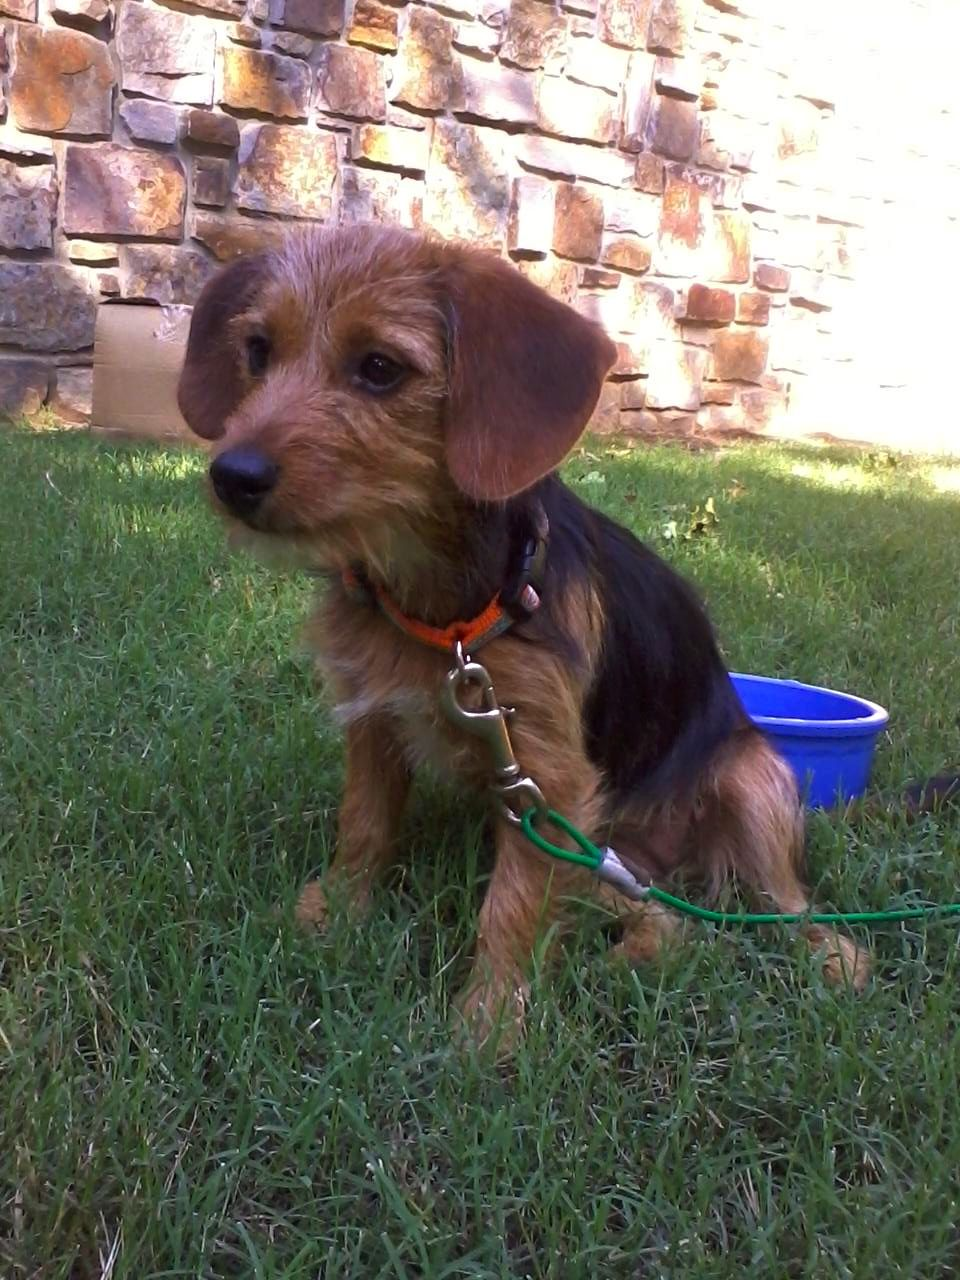 My Dorkie Puppy Dachshund Yorkie Dorkie Randomization